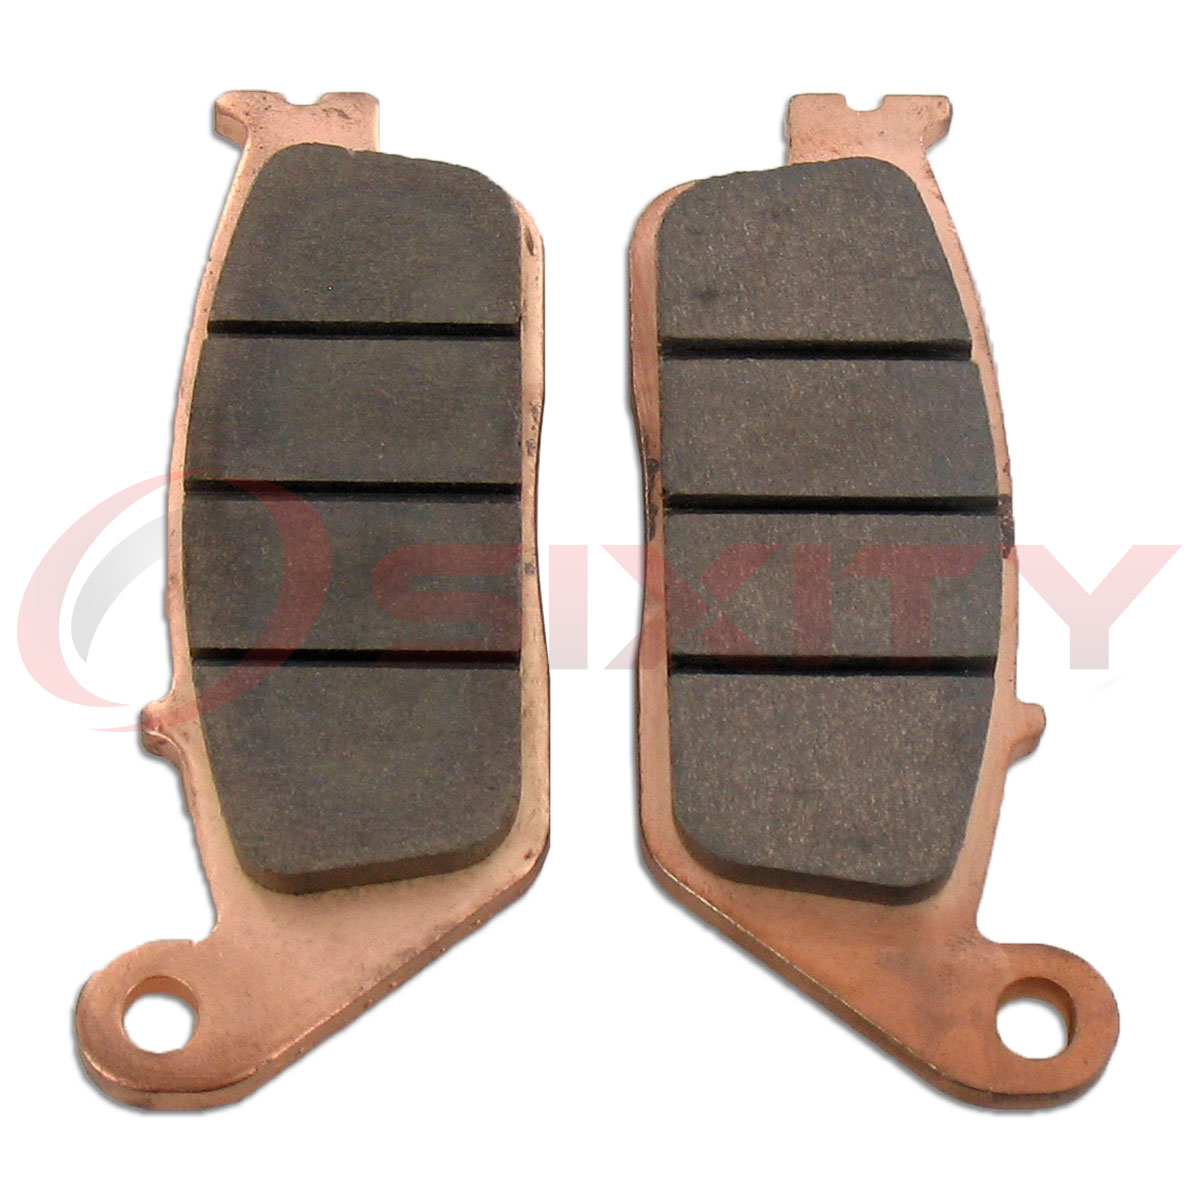 Carlson Quality Brake Parts 16057 Caliper Pin Boot Kit